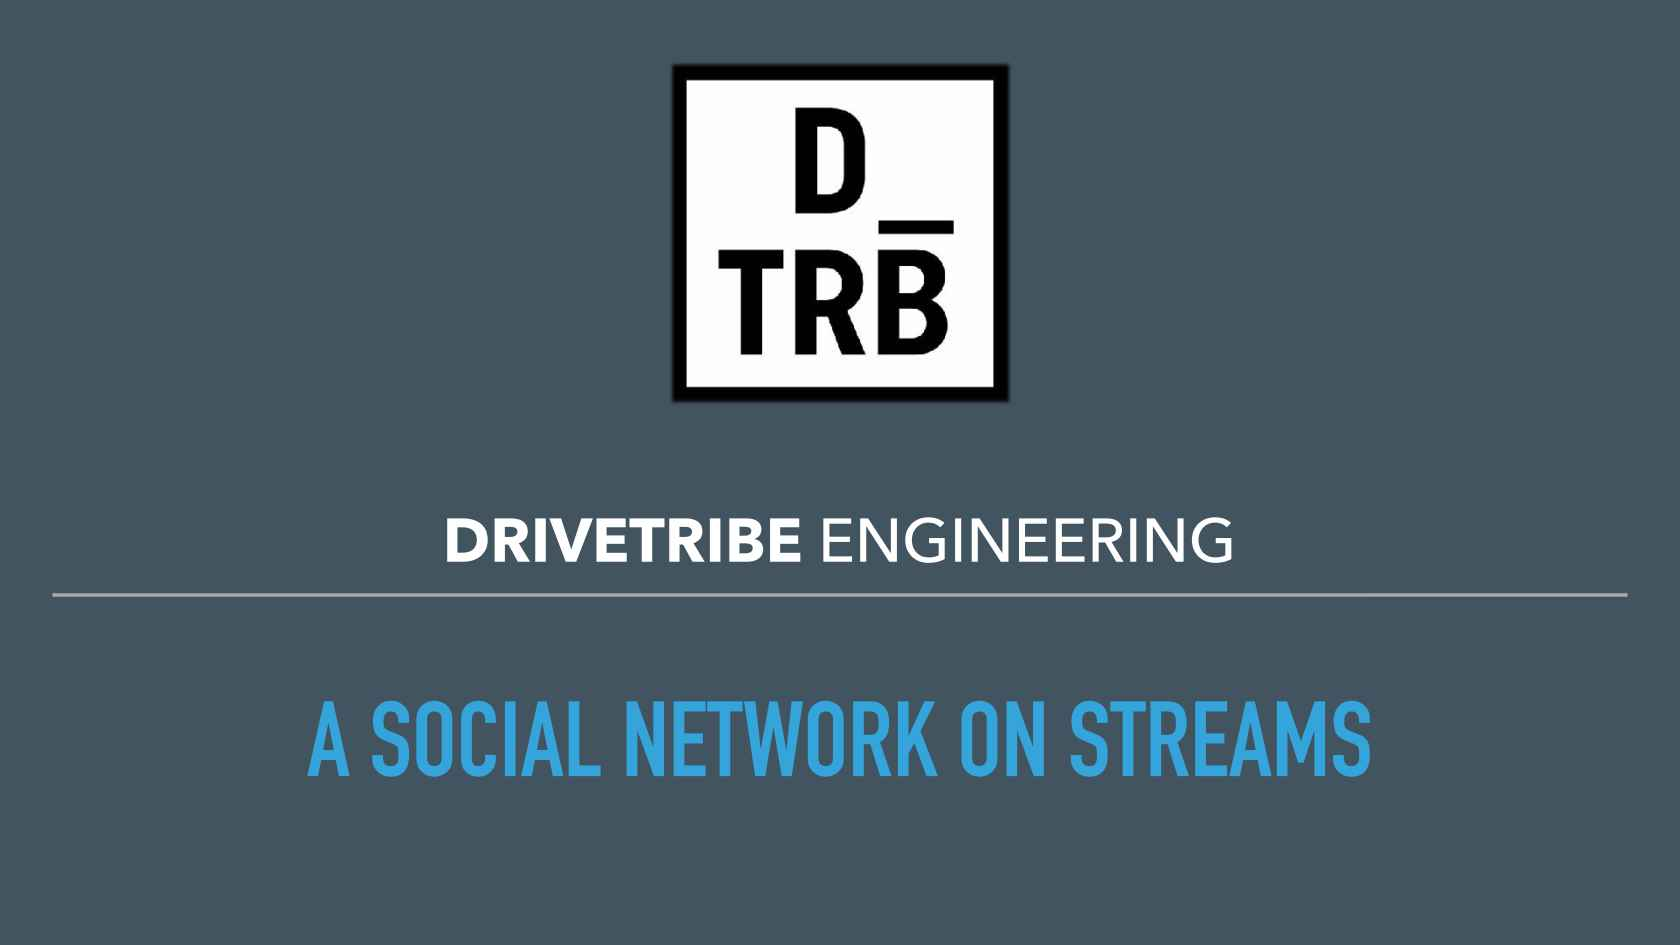 Drivetribe: A Social Network on Streams